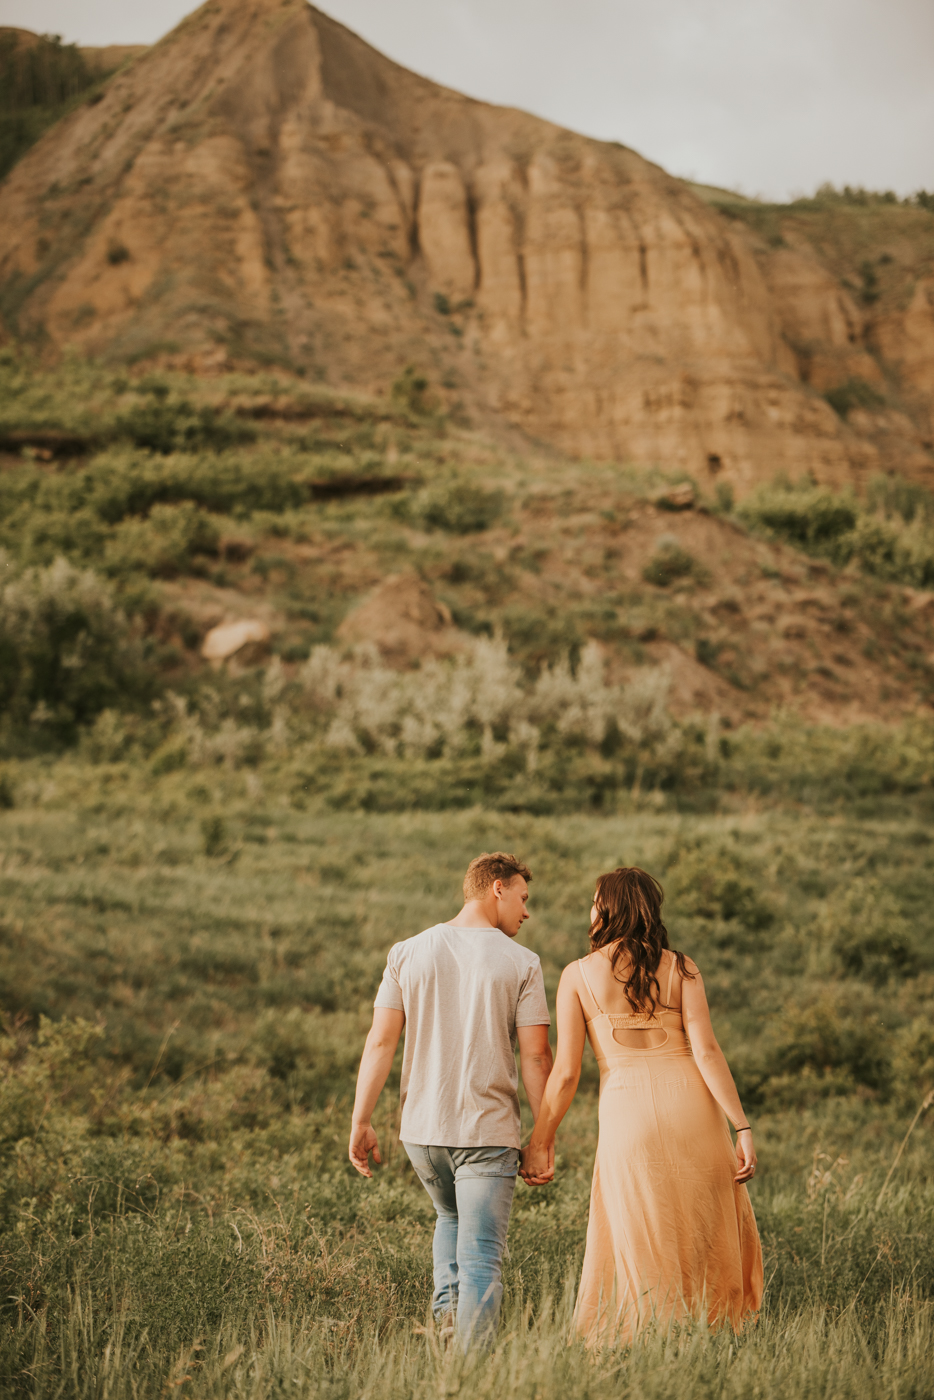 tyraephotography_photographer_wedding_elopement_engagement_photography-2-12.jpg